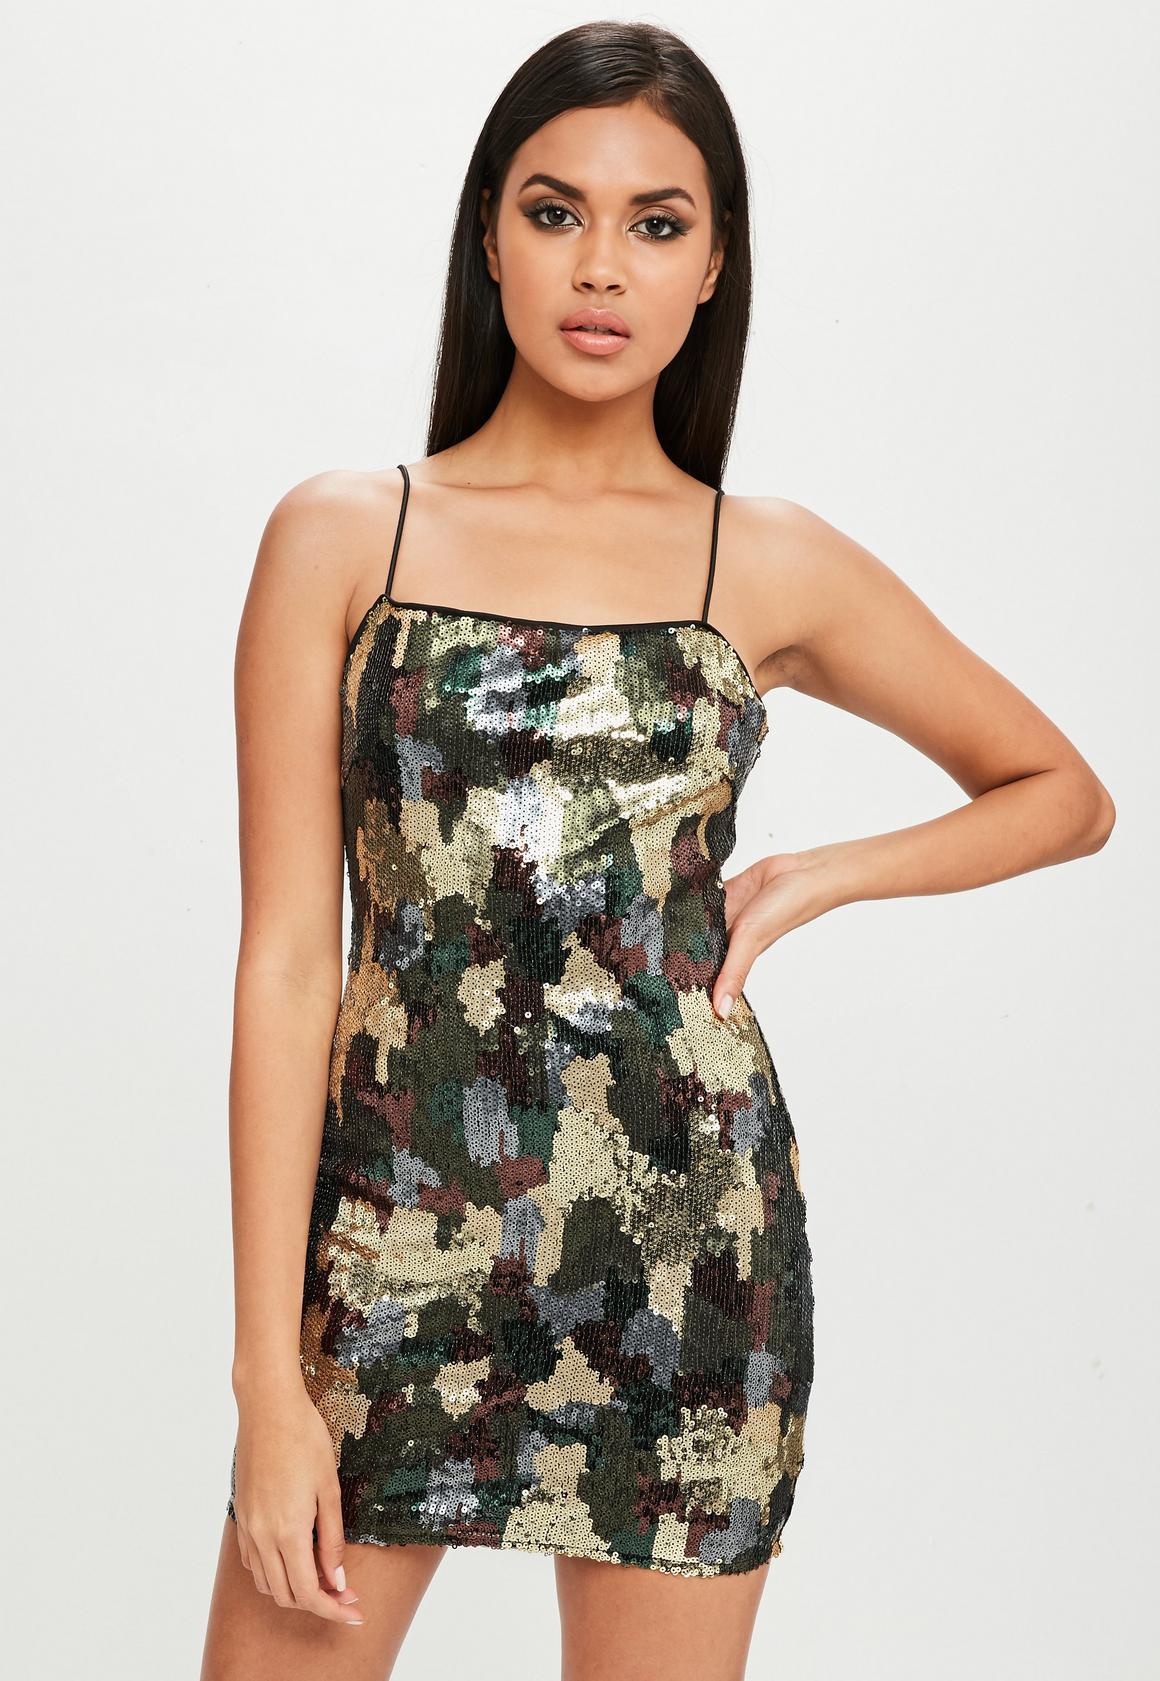 Carli Bybel x Missguided Grünes Camouflage Pailletten-Kleid   Missguided